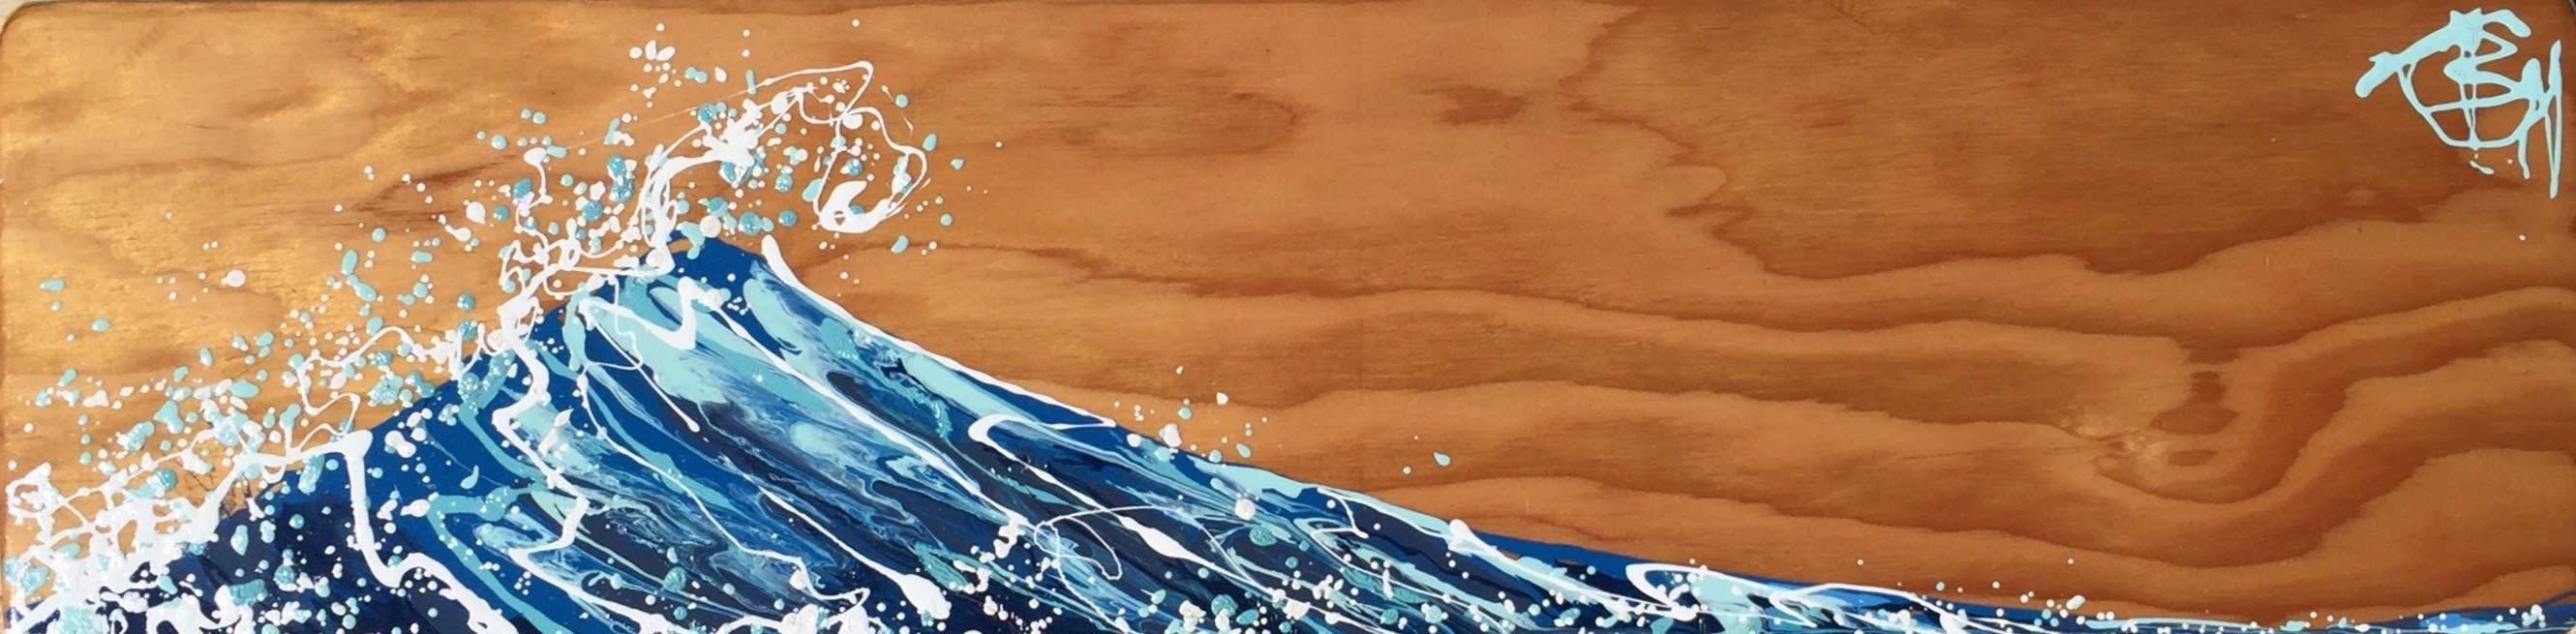 Wave of joy natural 2 8x30  e4p8f1